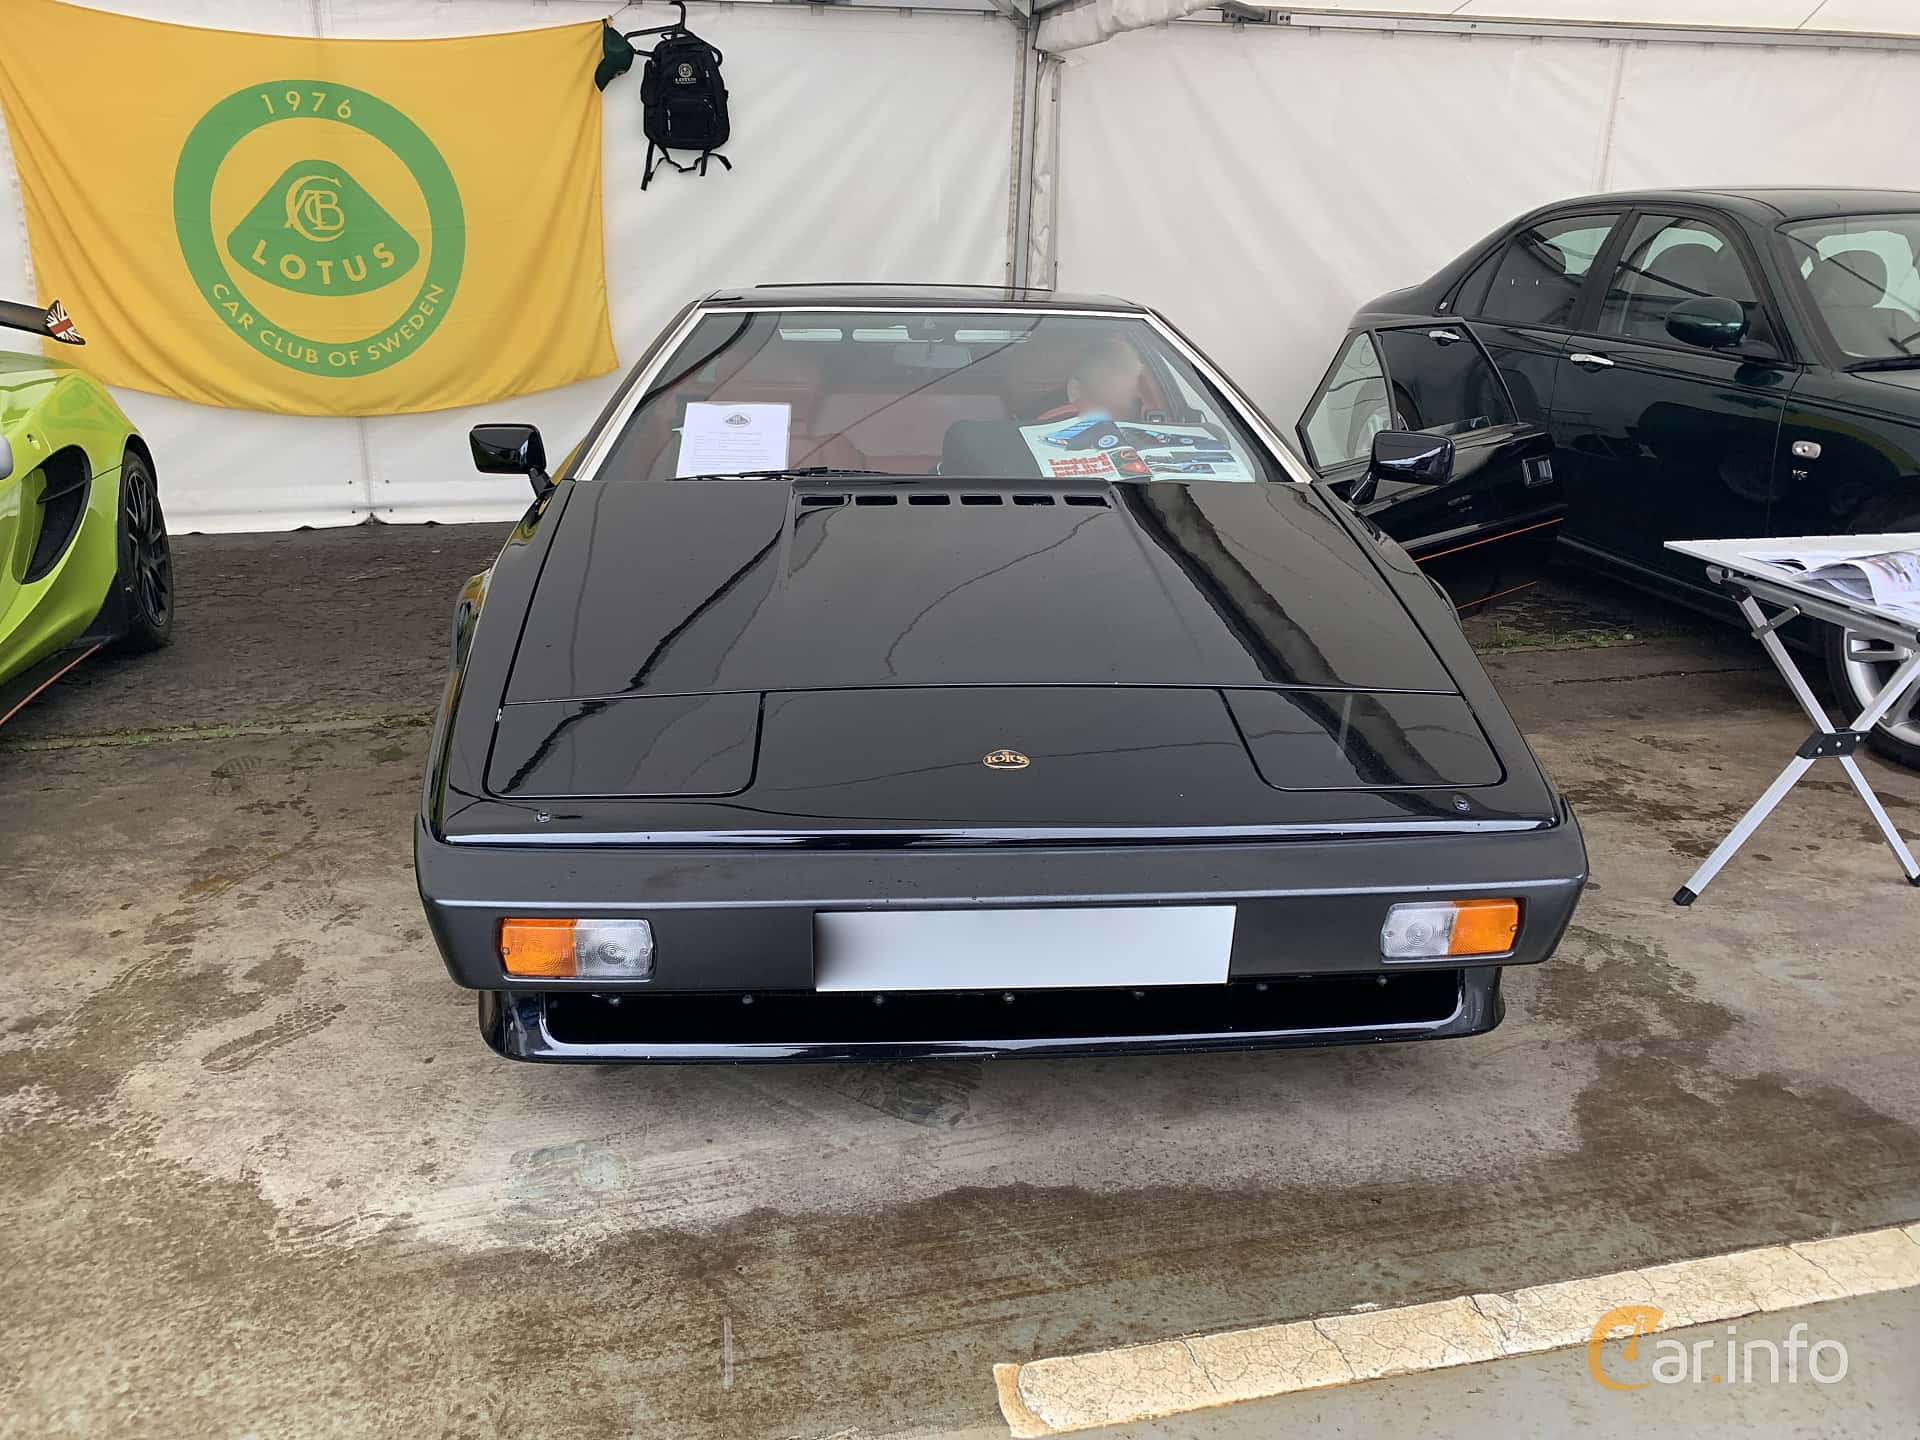 Lotus Esprit Turbo 2.2 Manual, 212hp, 1981 at Svenskt sportvagnsmeeting 2019